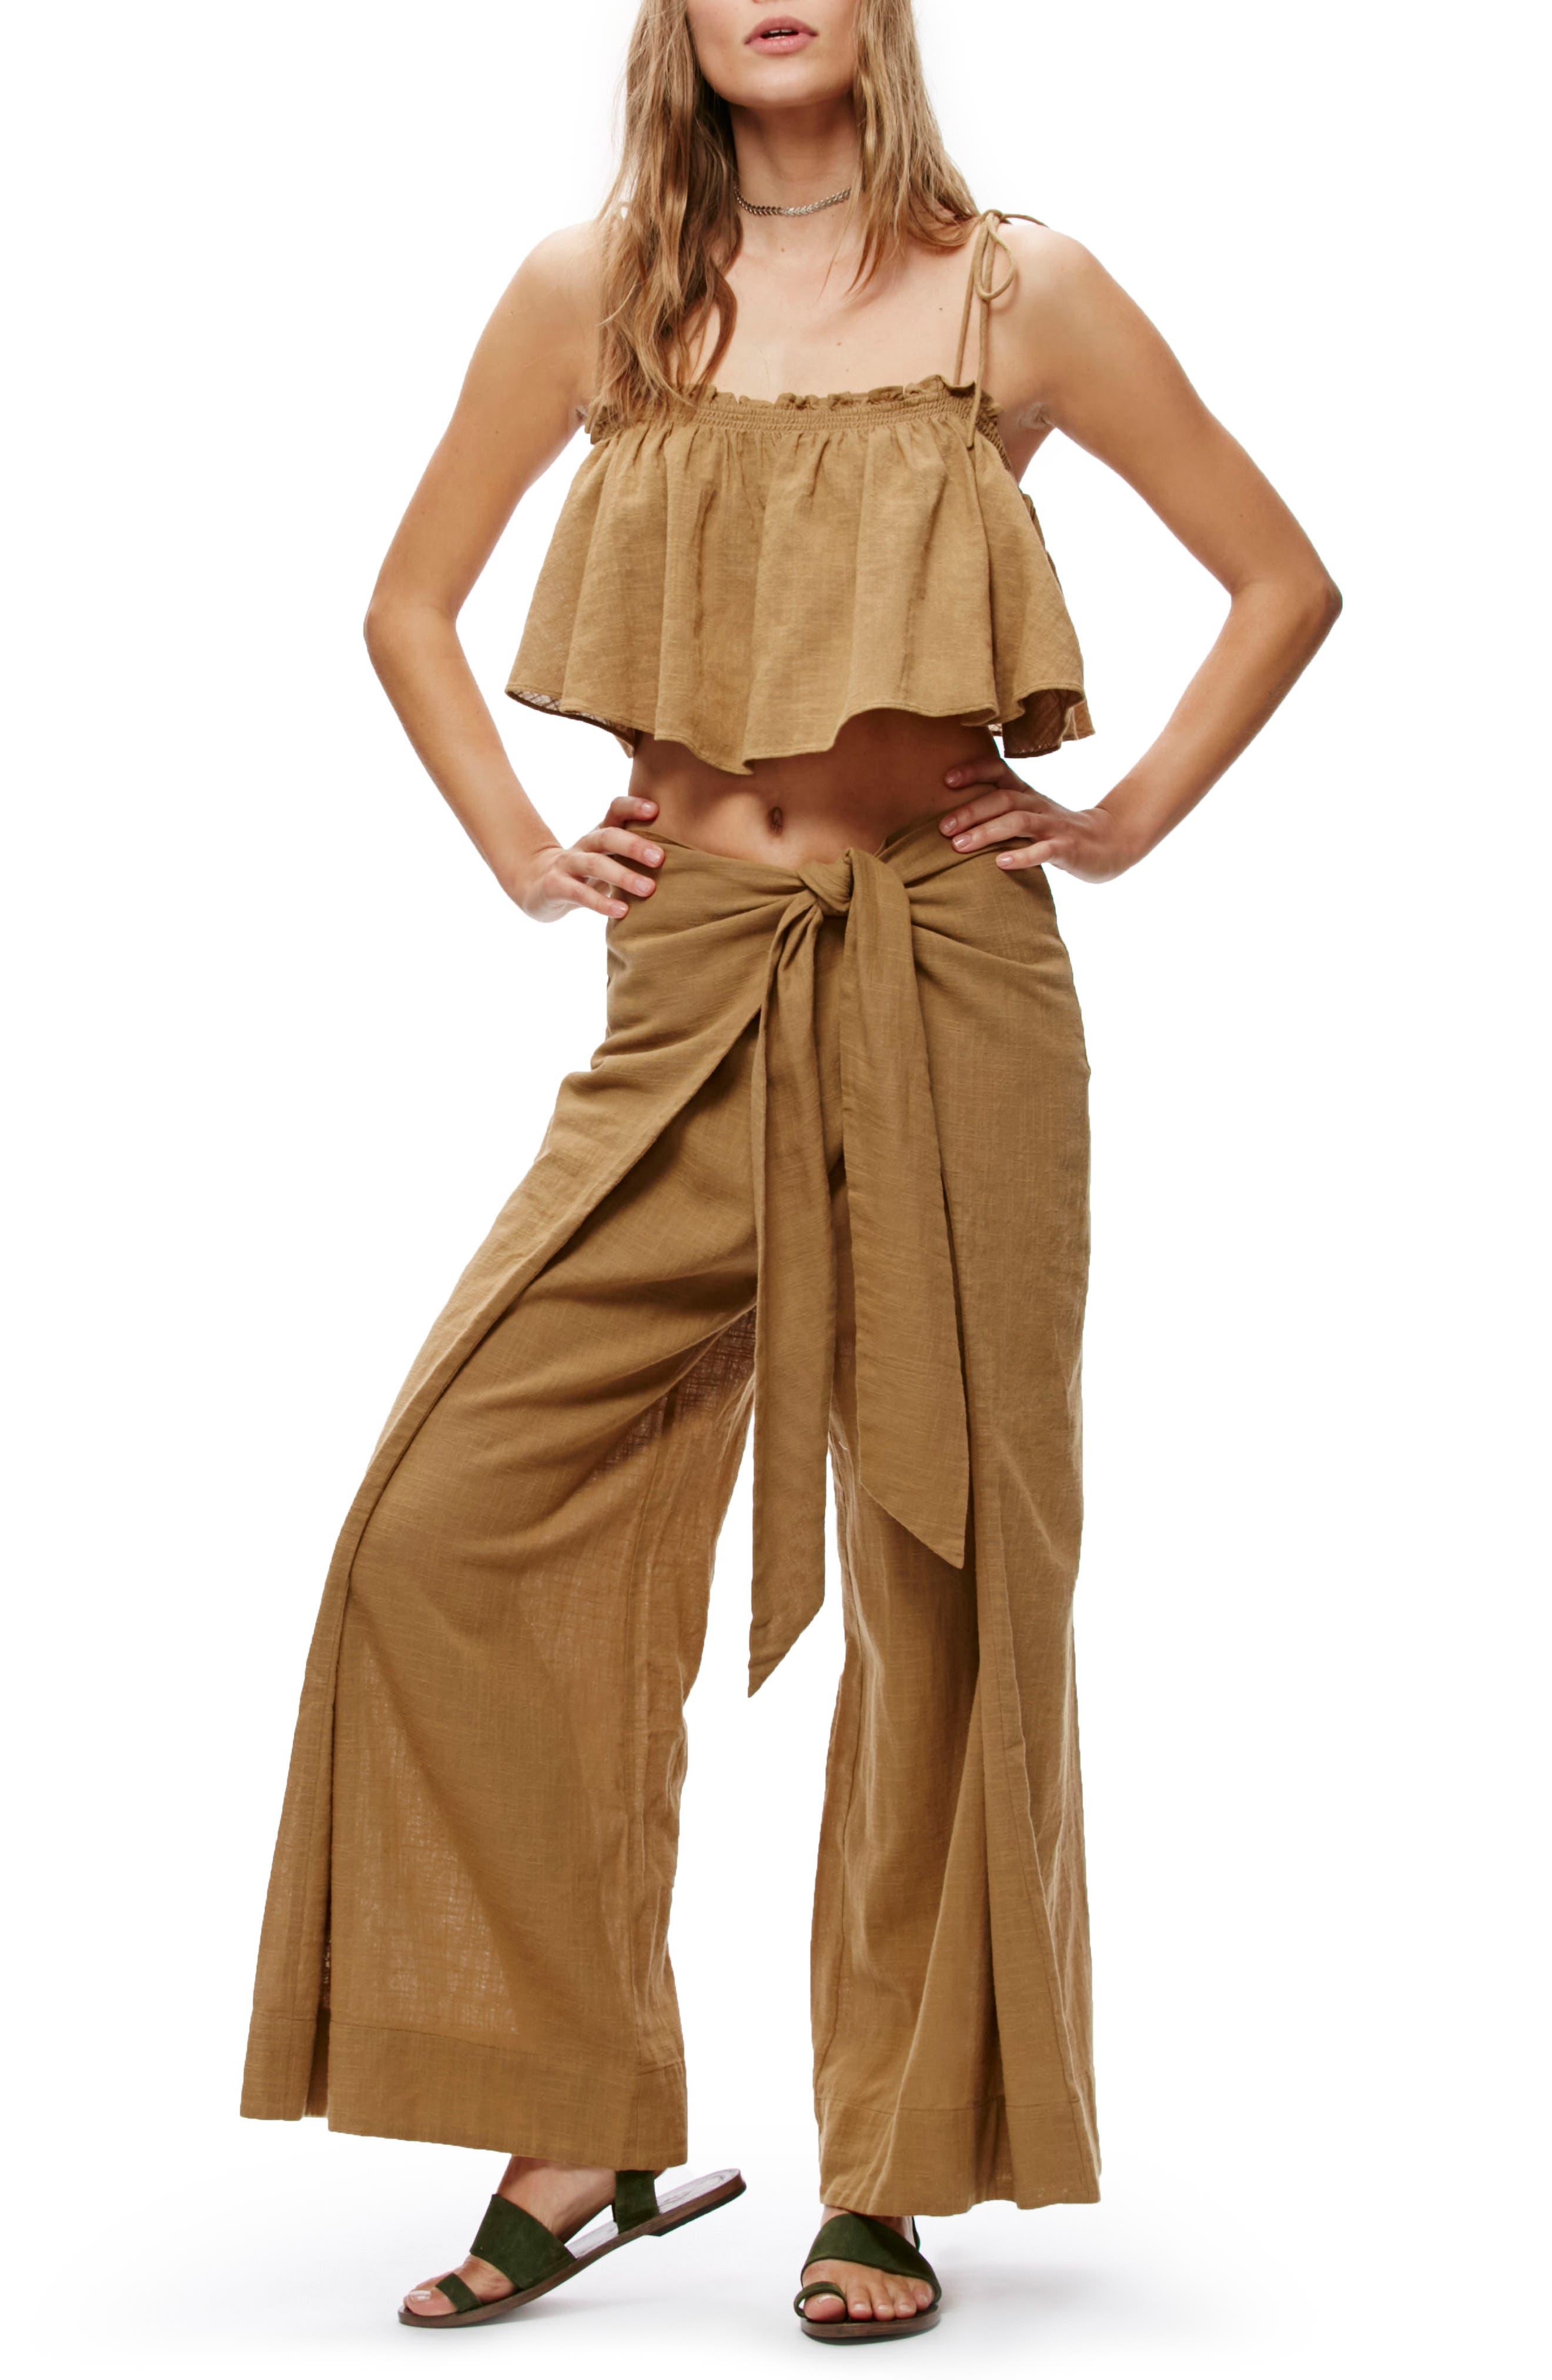 FREE PEOPLE,                             Tropic Babe Crop Top & High Waist Pants Set,                             Alternate thumbnail 5, color,                             203